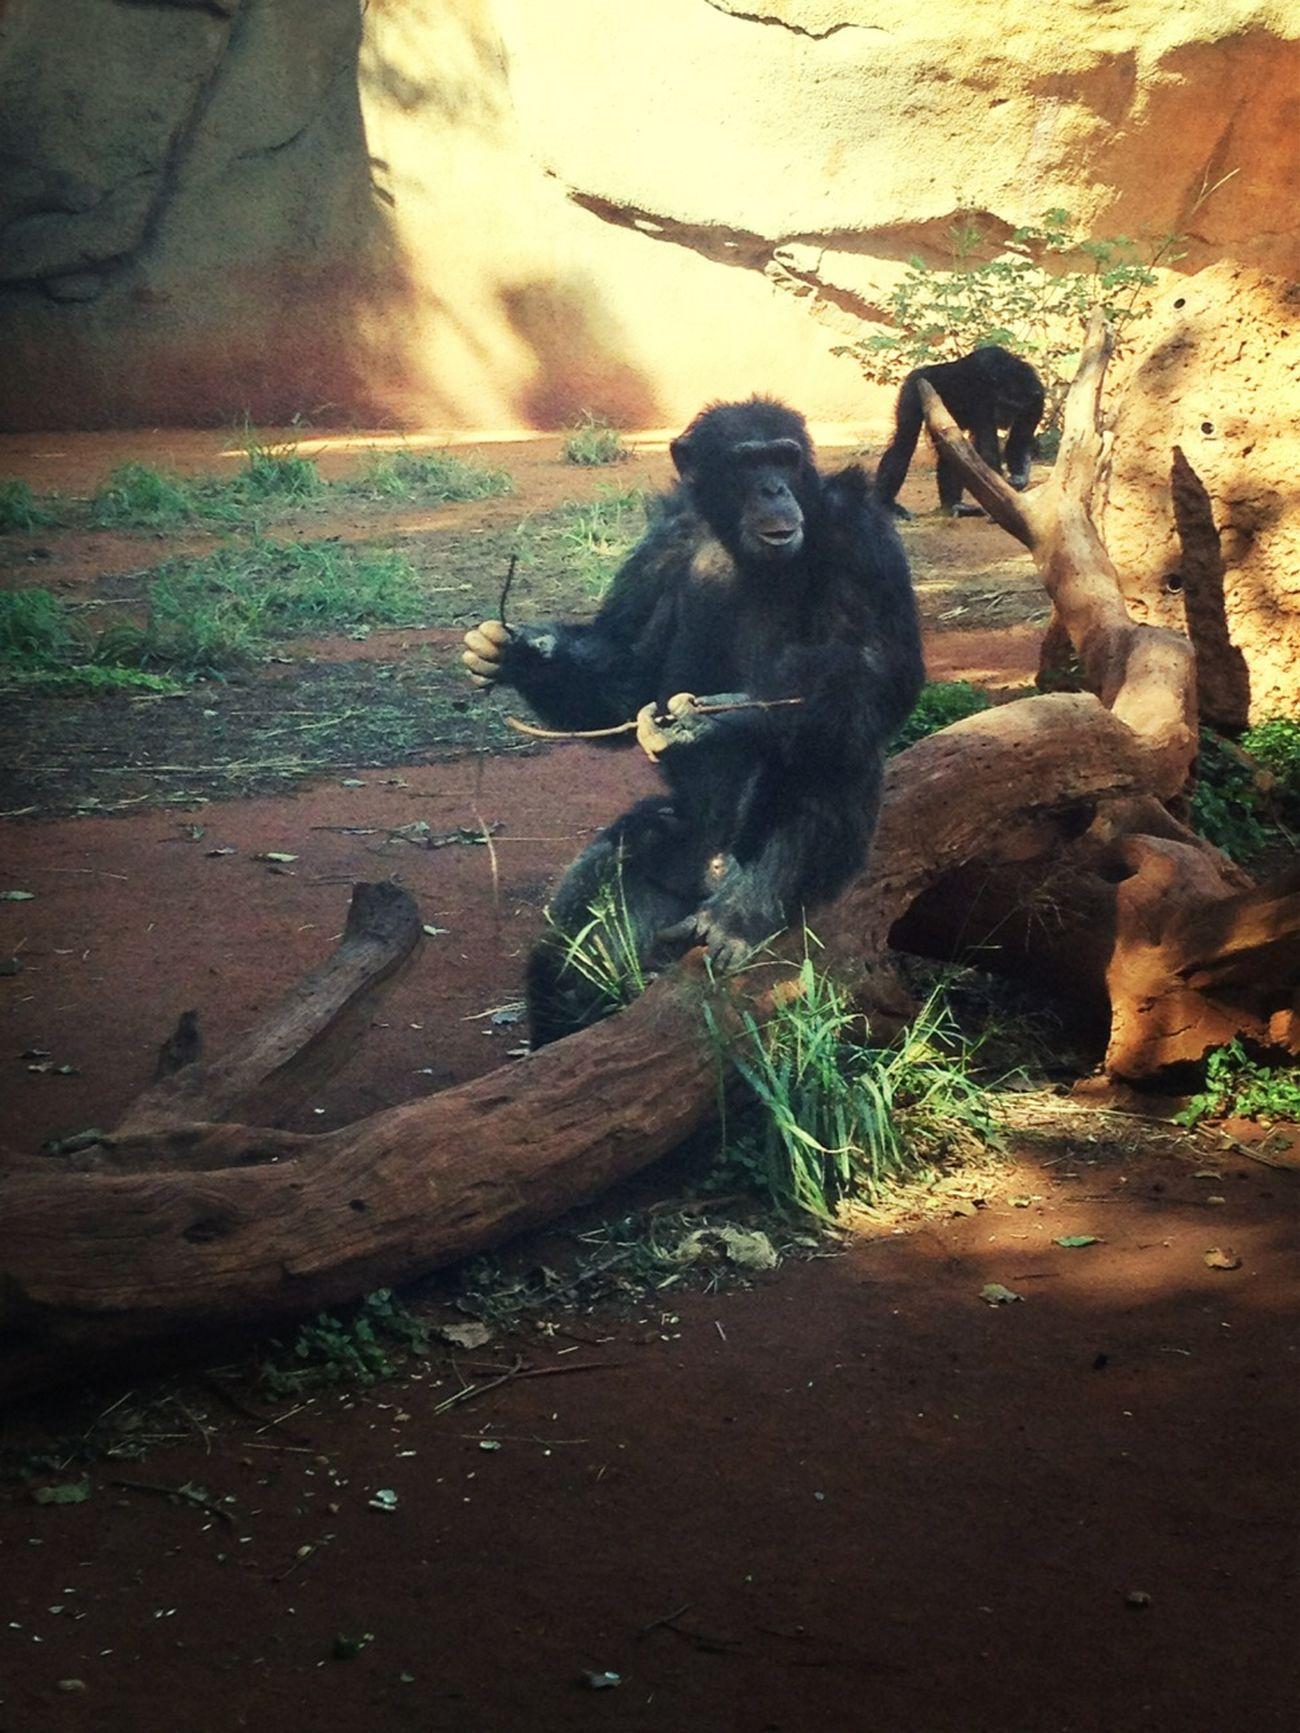 crazy chimpanzee!!